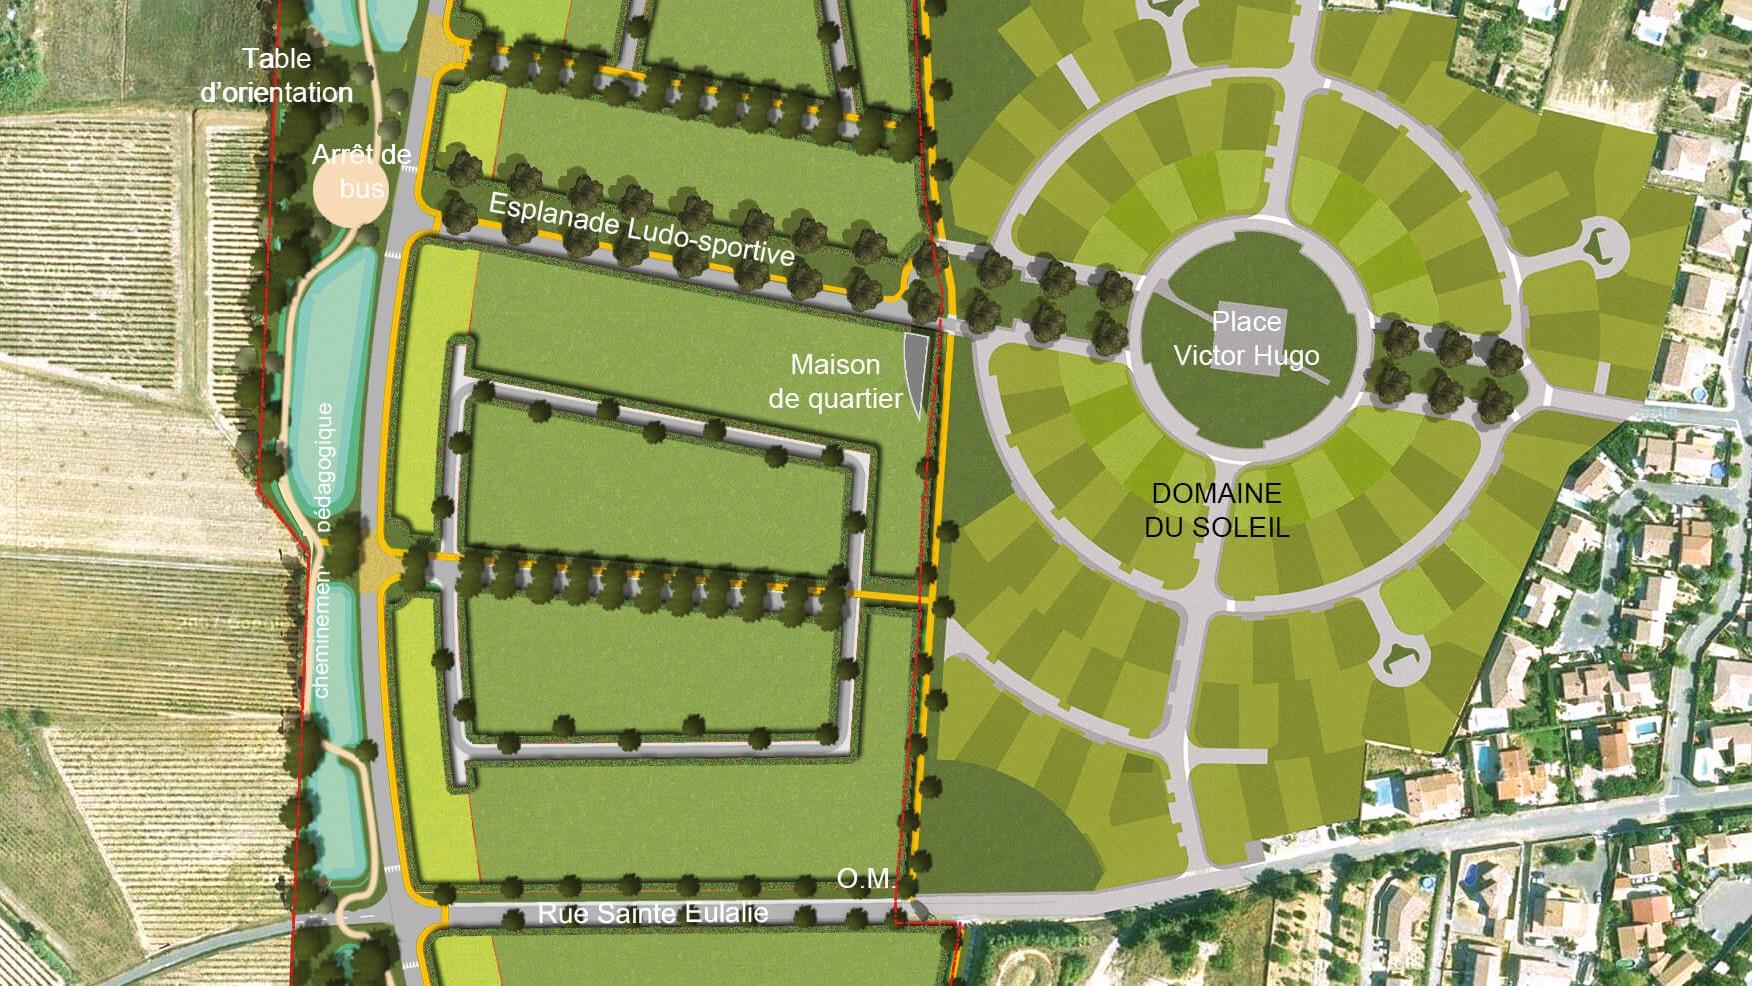 BETU | Urbanisme à Béziers | Environnement